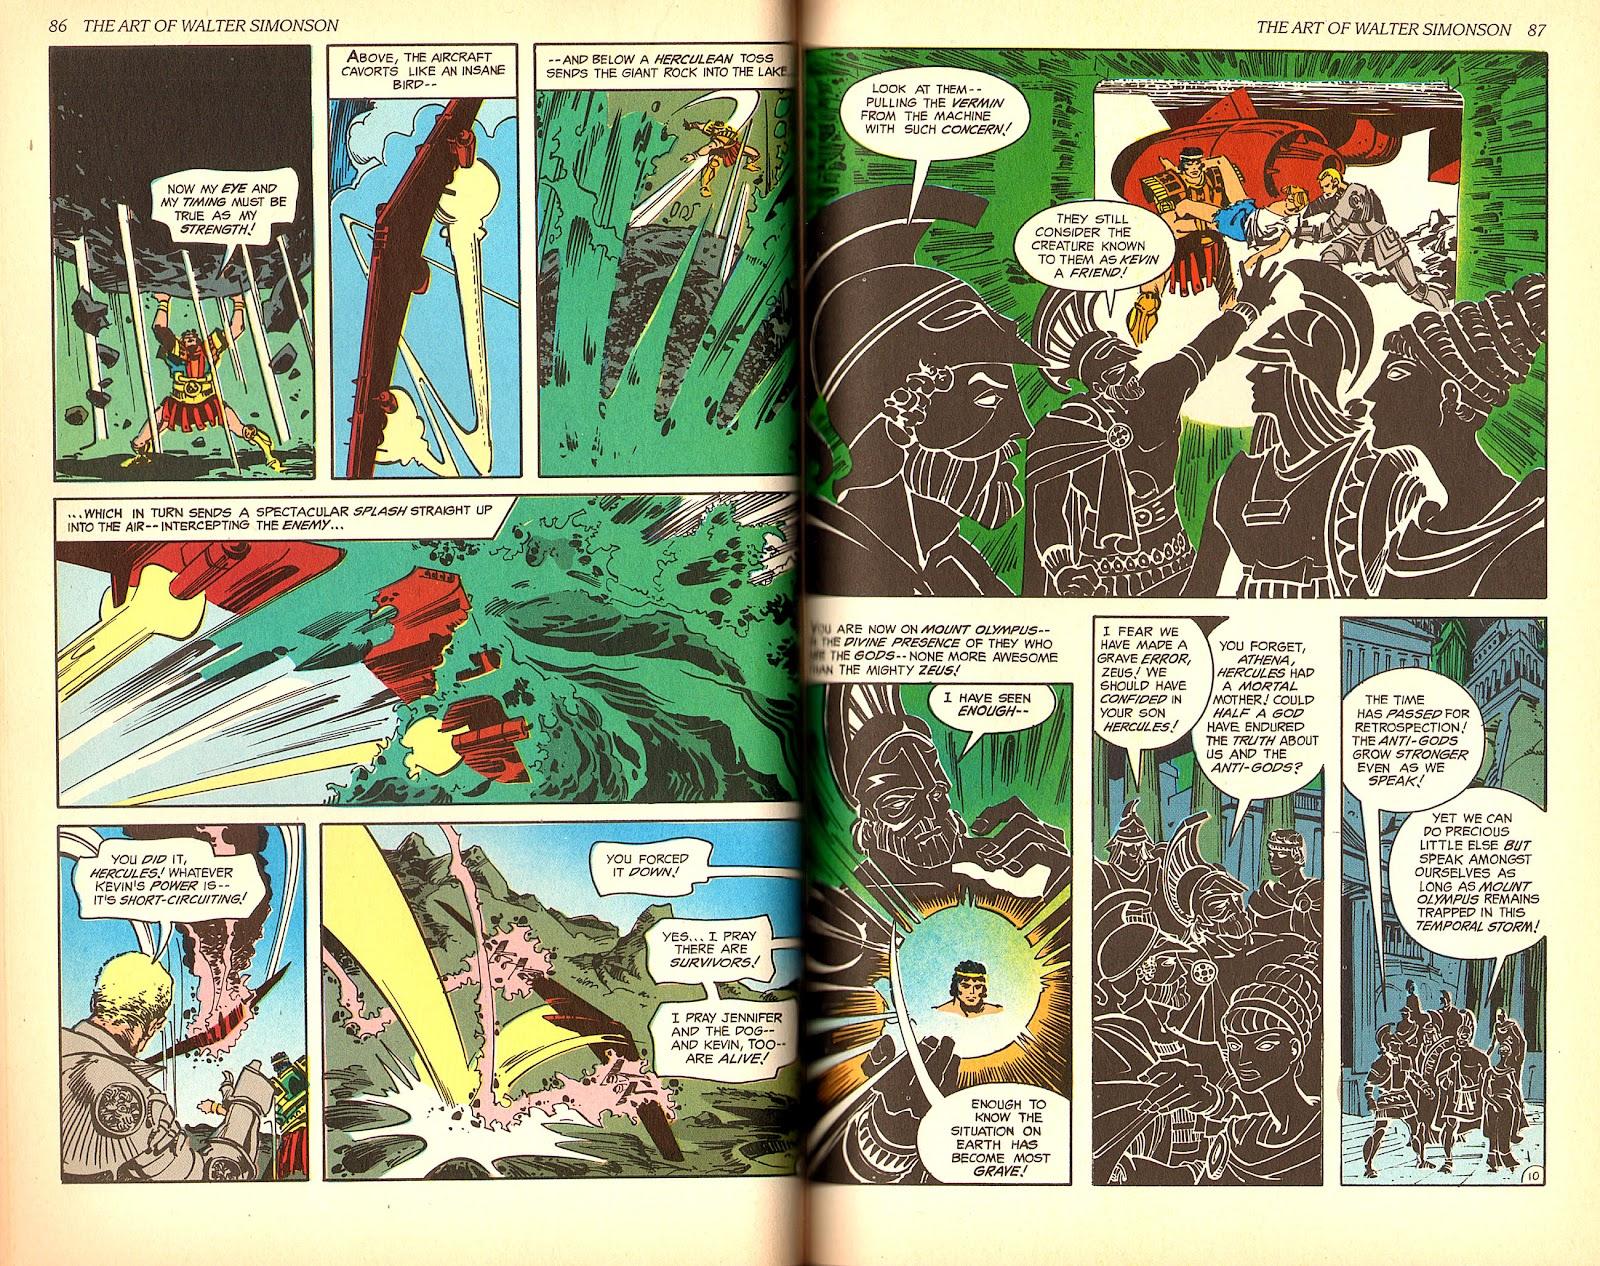 Read online The Art of Walter Simonson comic -  Issue # TPB - 45